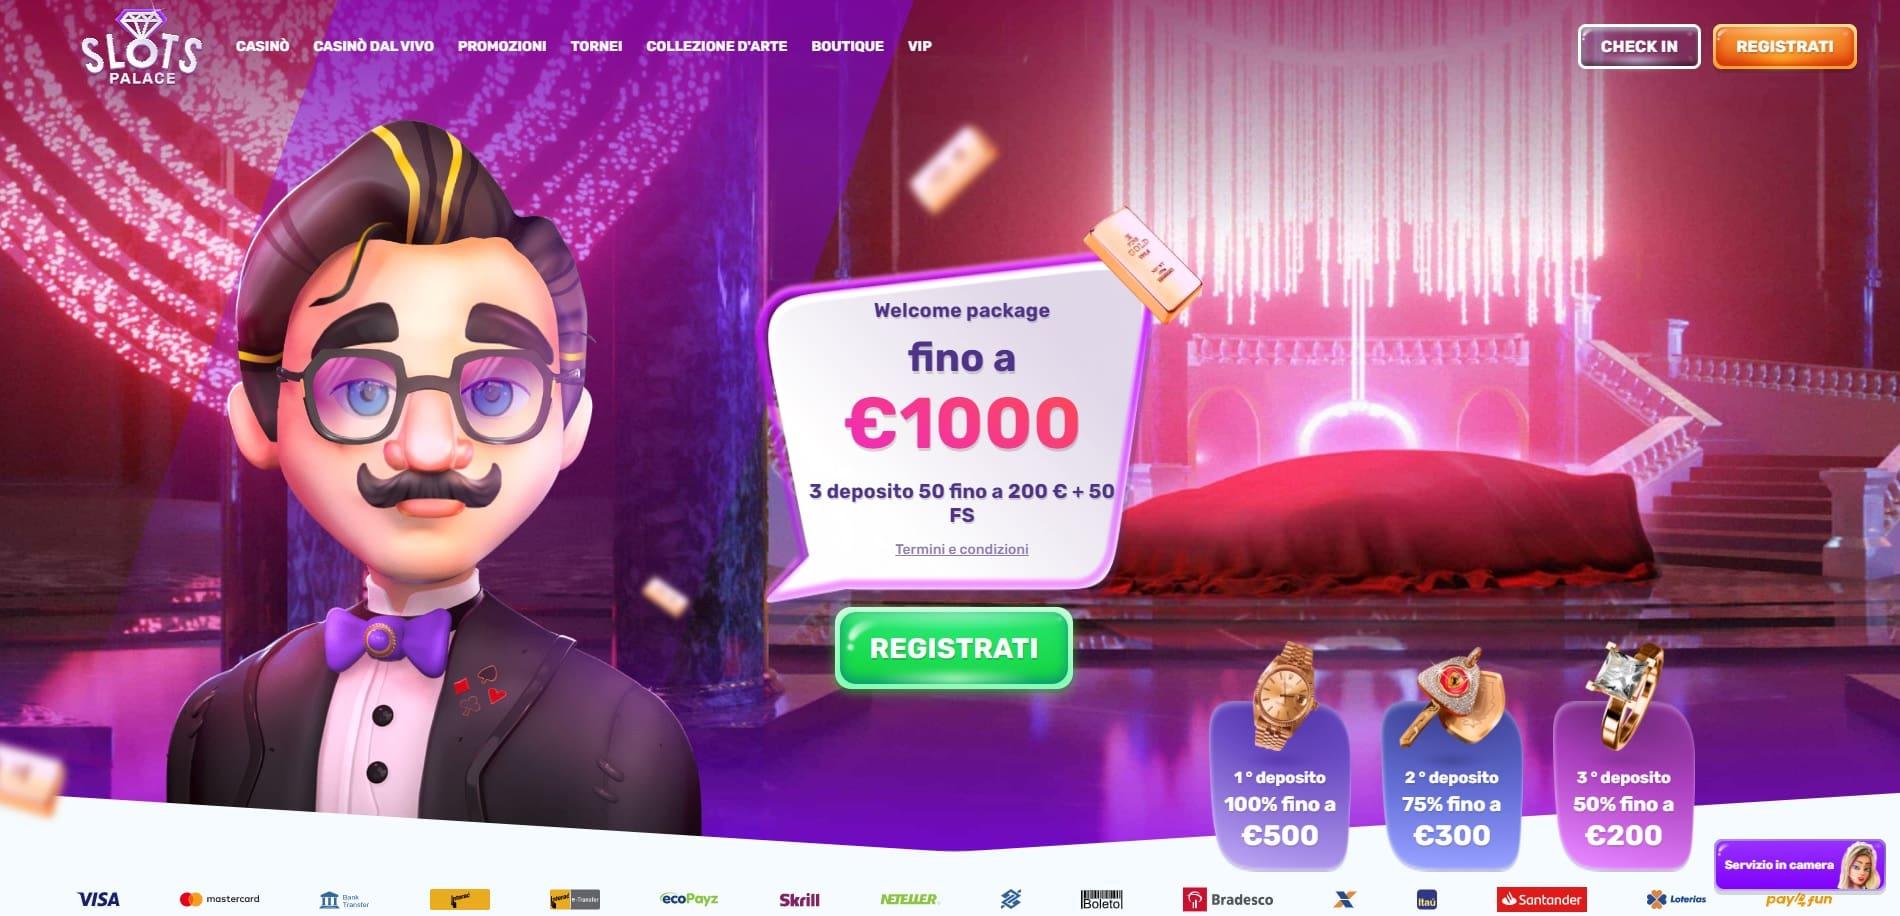 casinò online stranieri slots palace